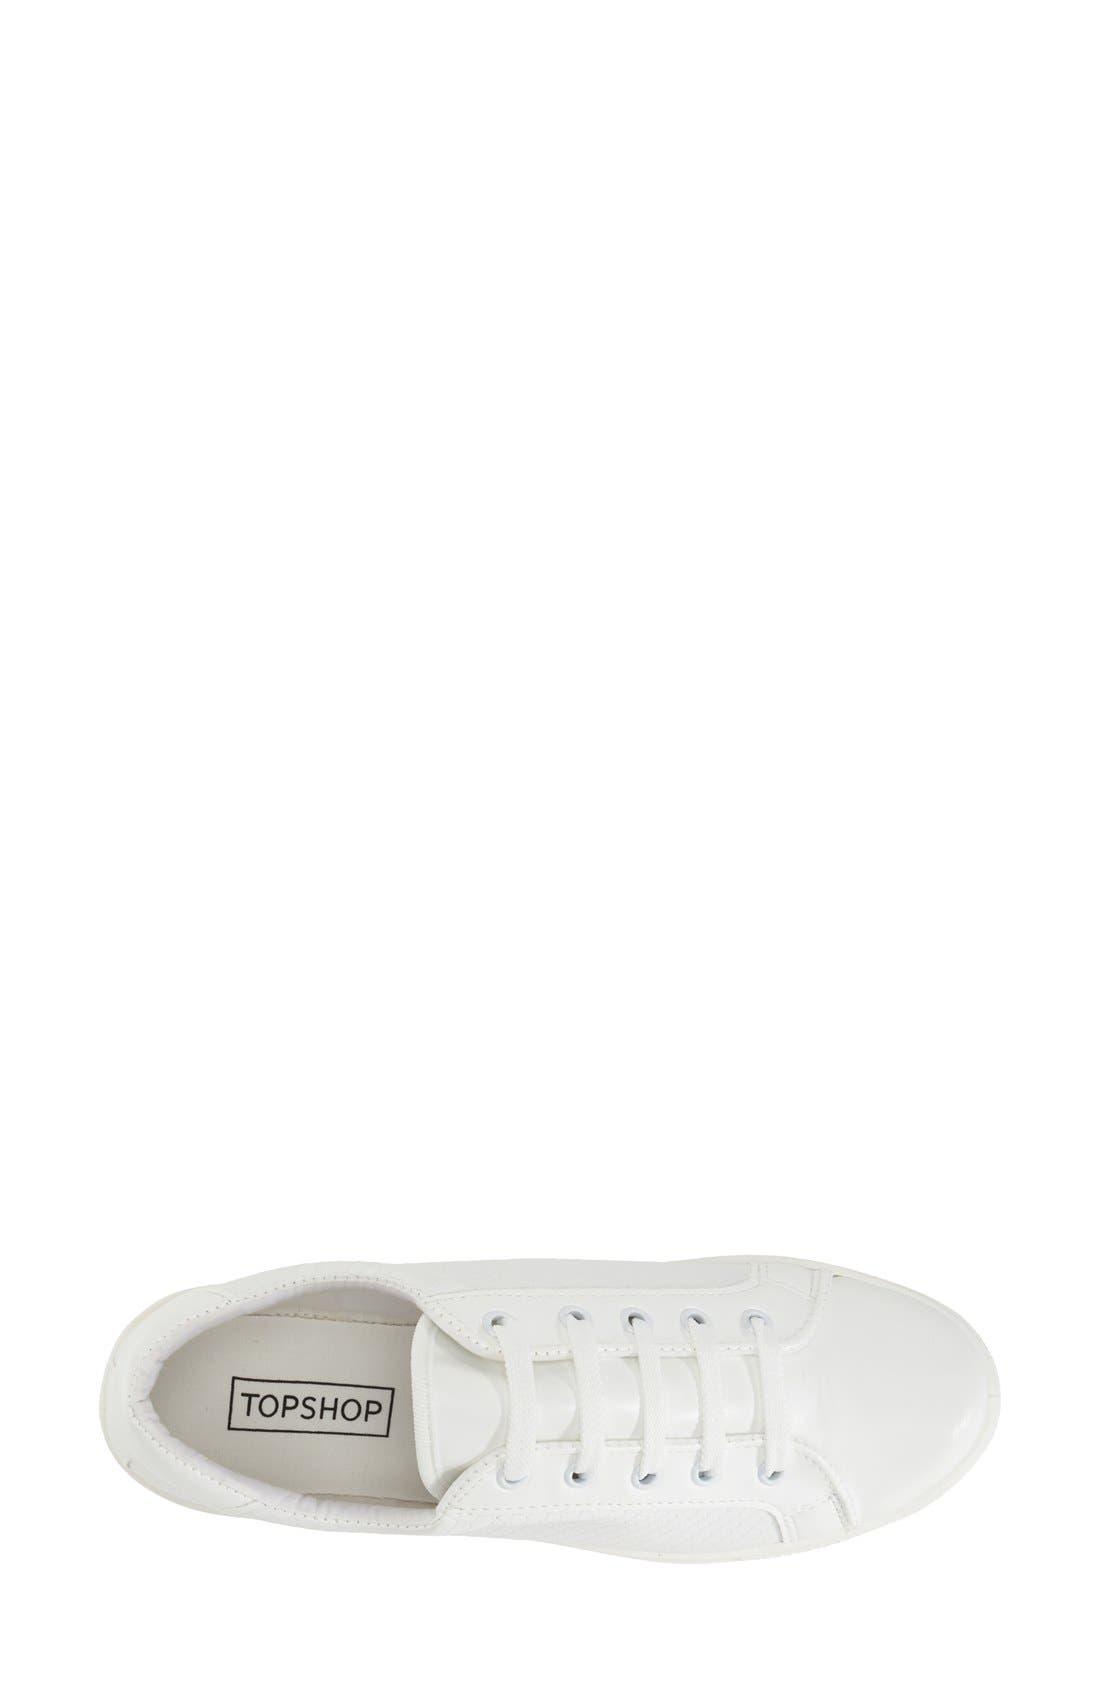 'Copenhagen' Lizard Embossed Faux Leather Sneaker,                             Alternate thumbnail 3, color,                             White